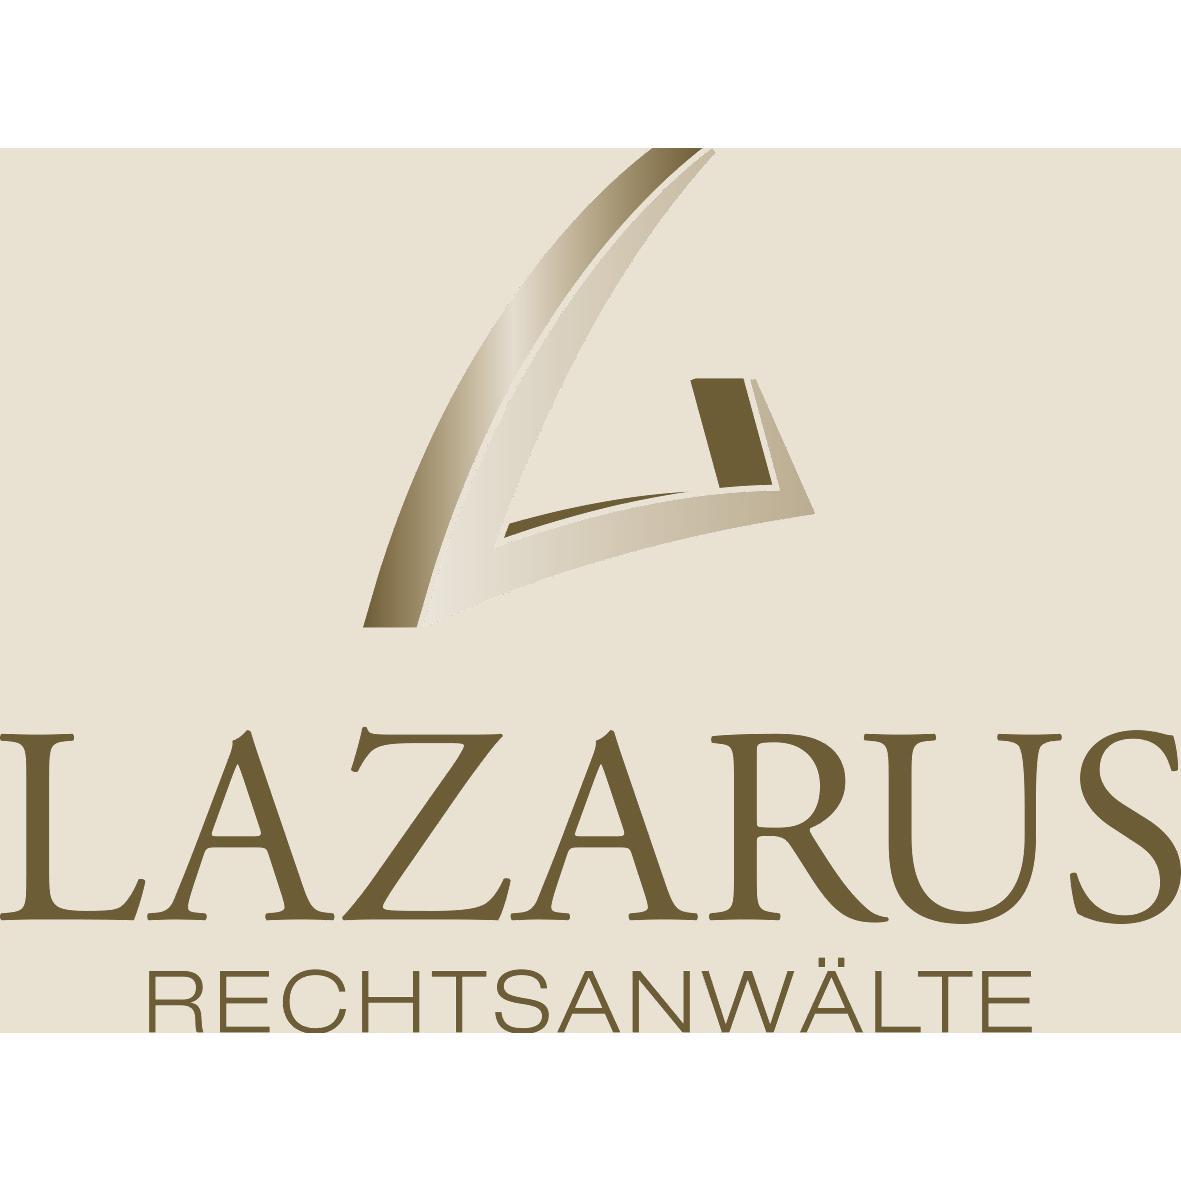 Lazarus Rechtsanwälte GbR in Königs Wusterhausen